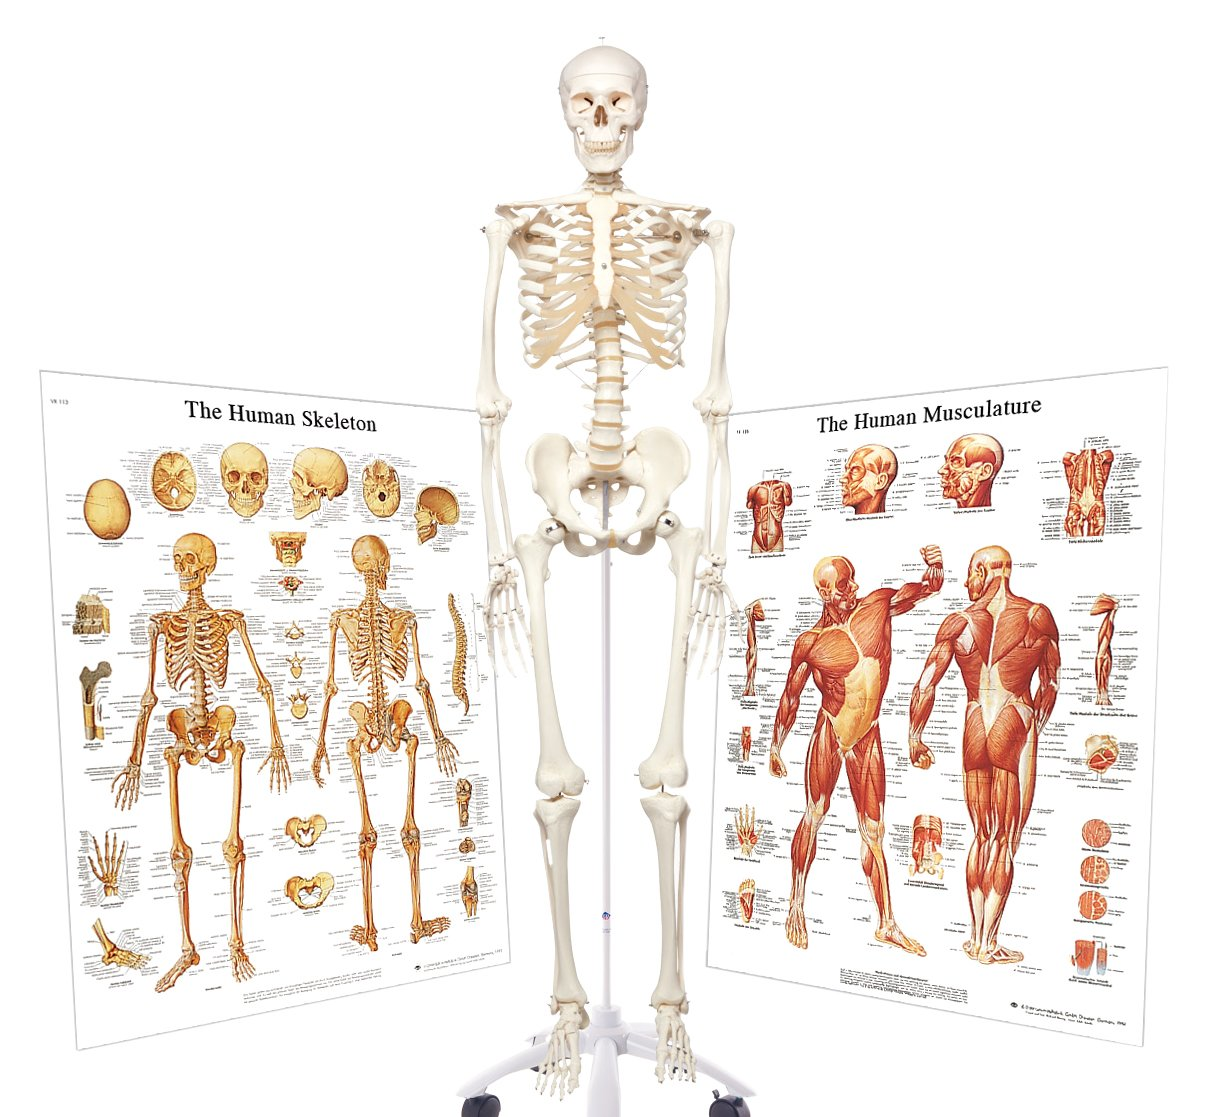 3b Scientific 3009200 Standard Human Skeleton With Skeletal System